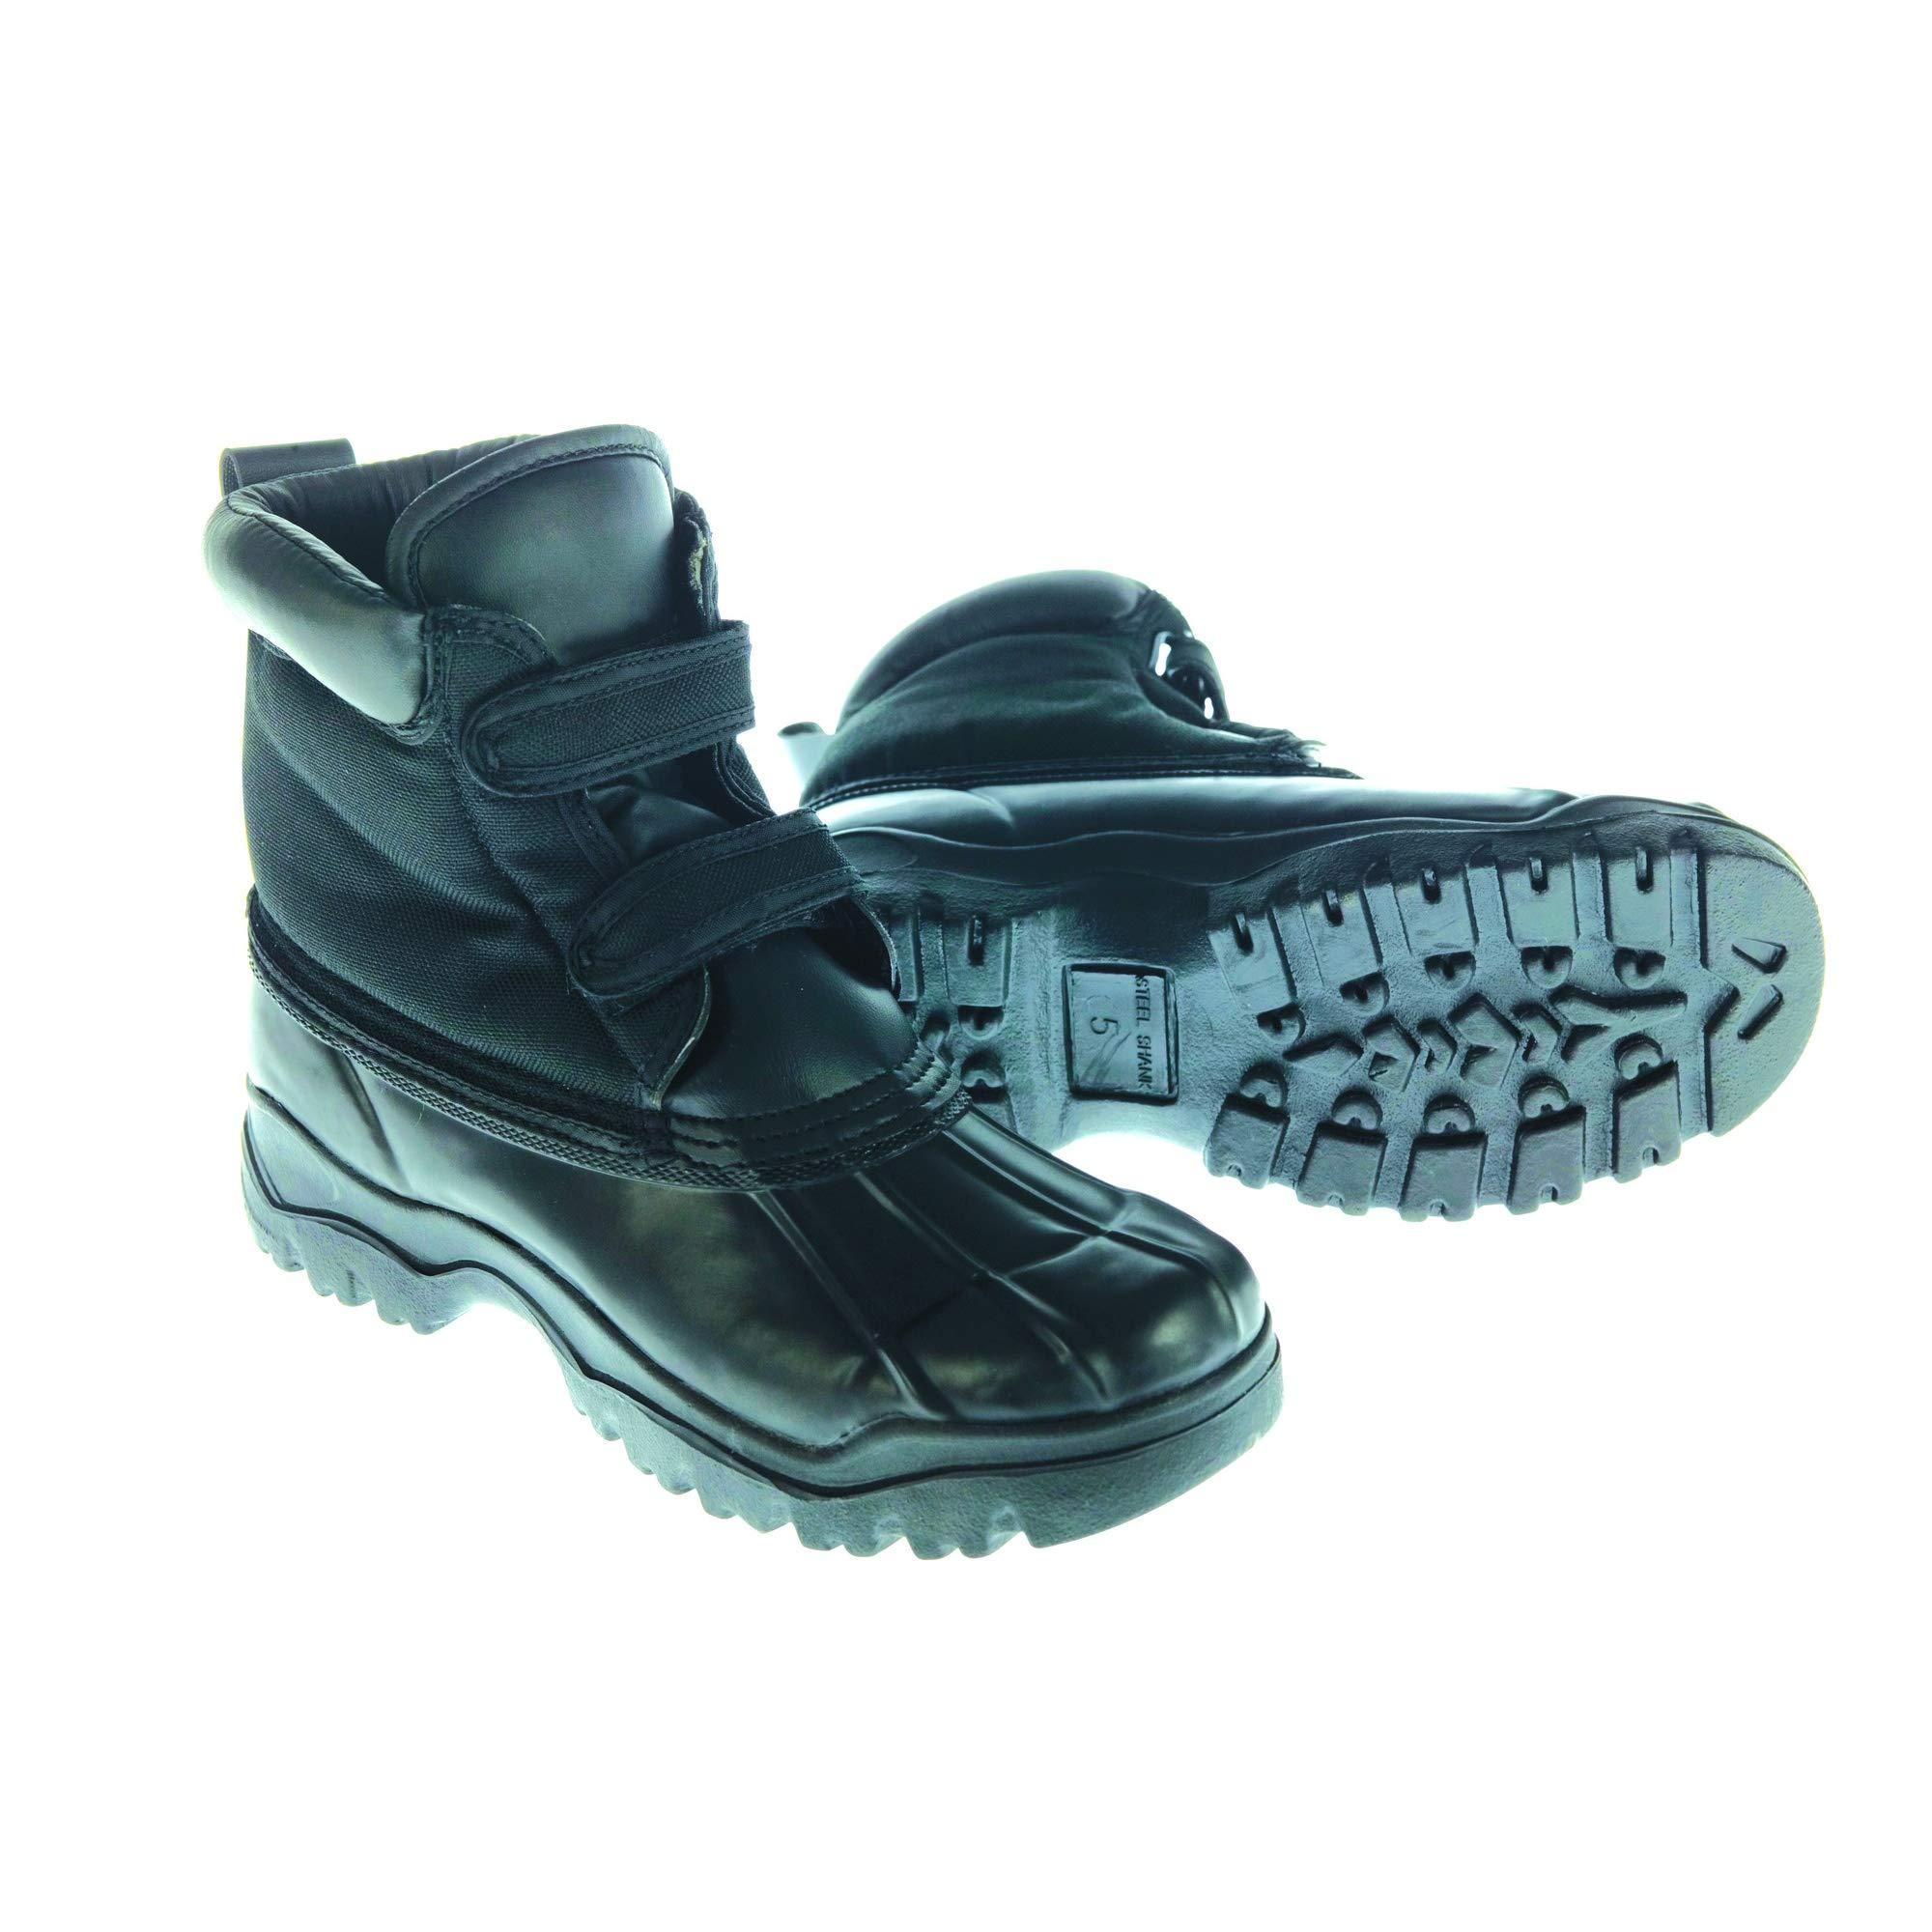 Dublin Childrens/Kids Yardmaster Touch Tape Boots (13 M US Little Kid) (Black)